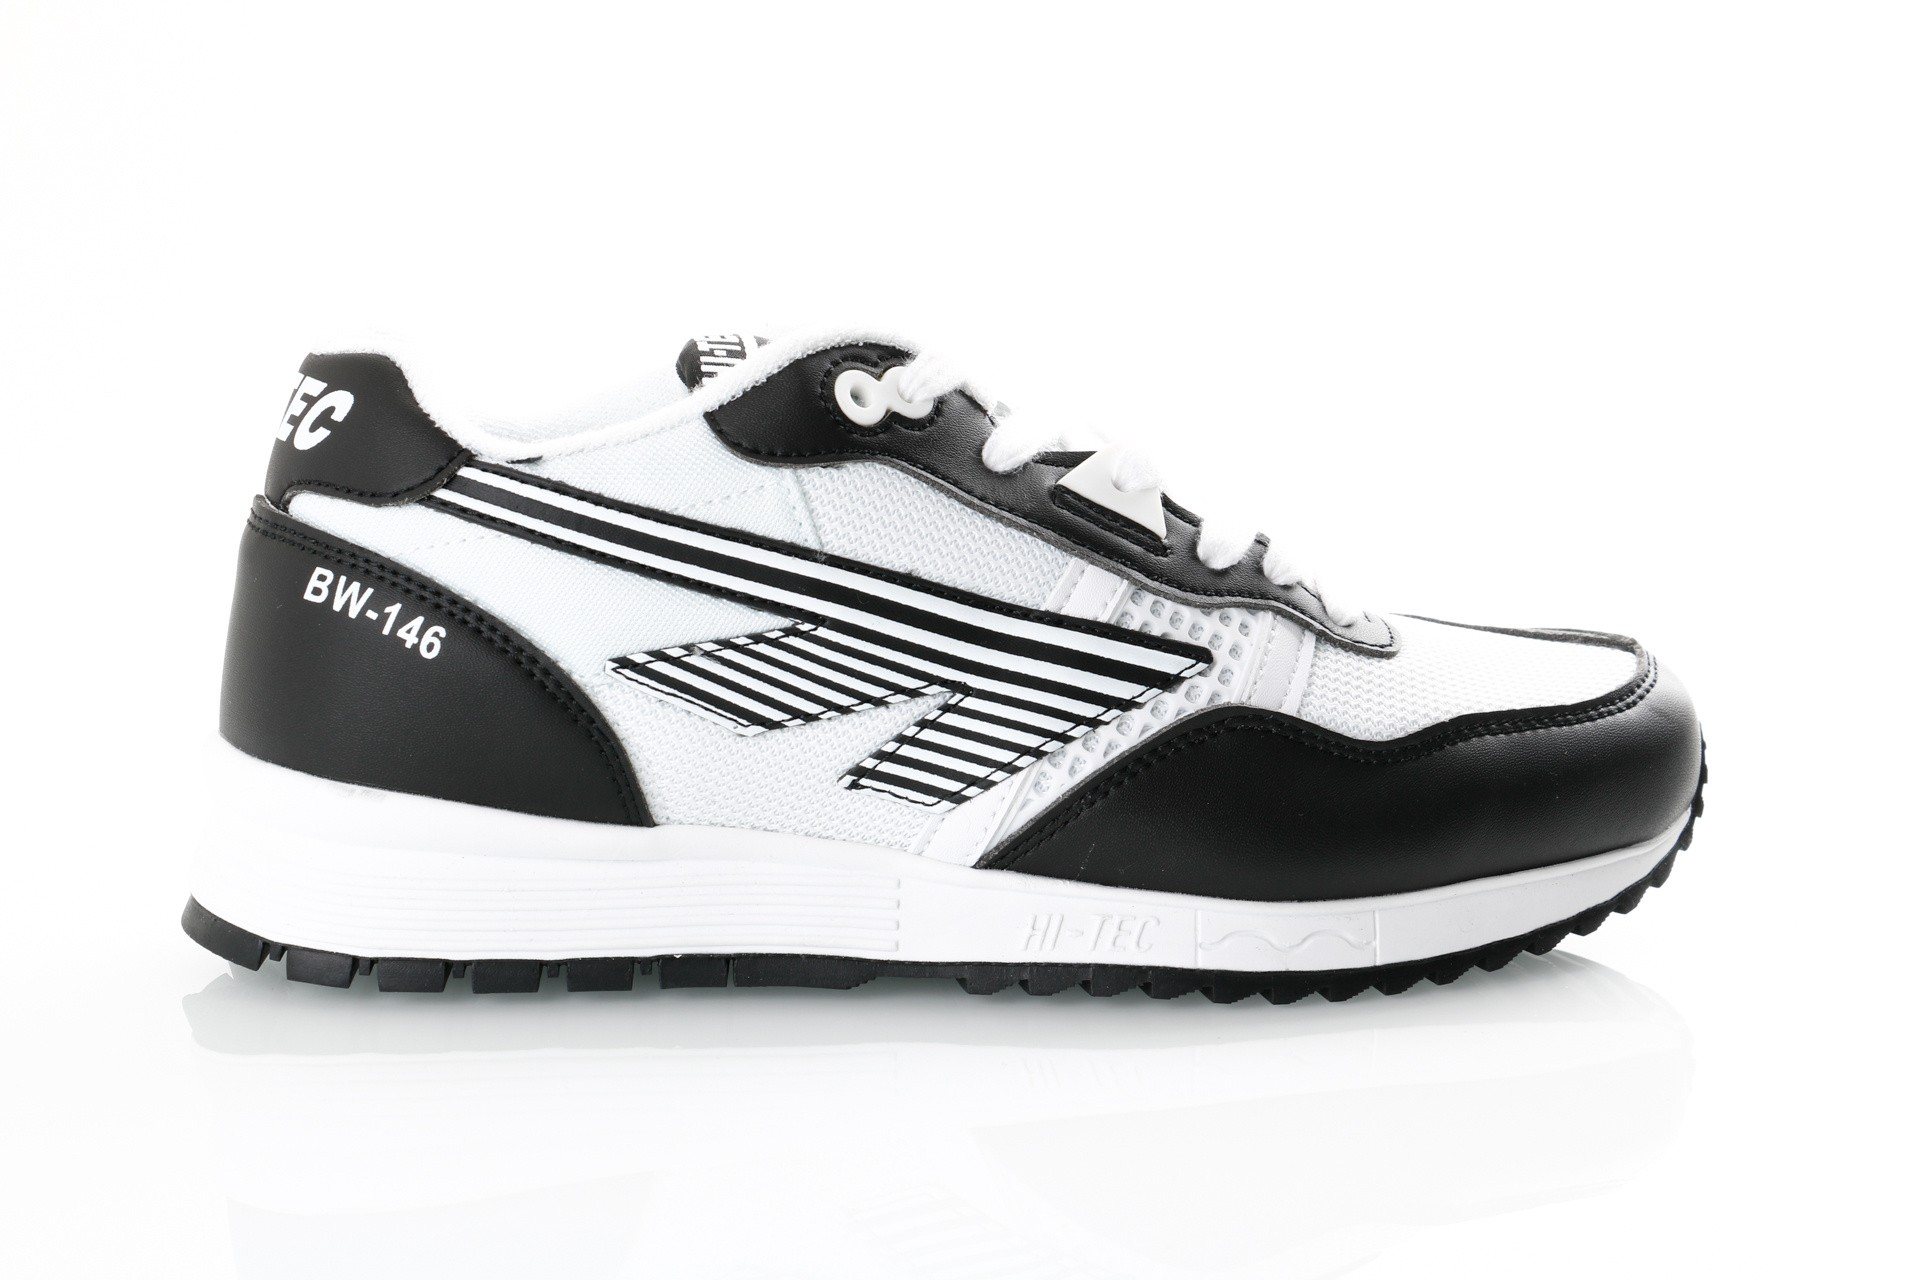 Foto van Hi-Tec Bw 146 S010003/021 Sneakers Black/White